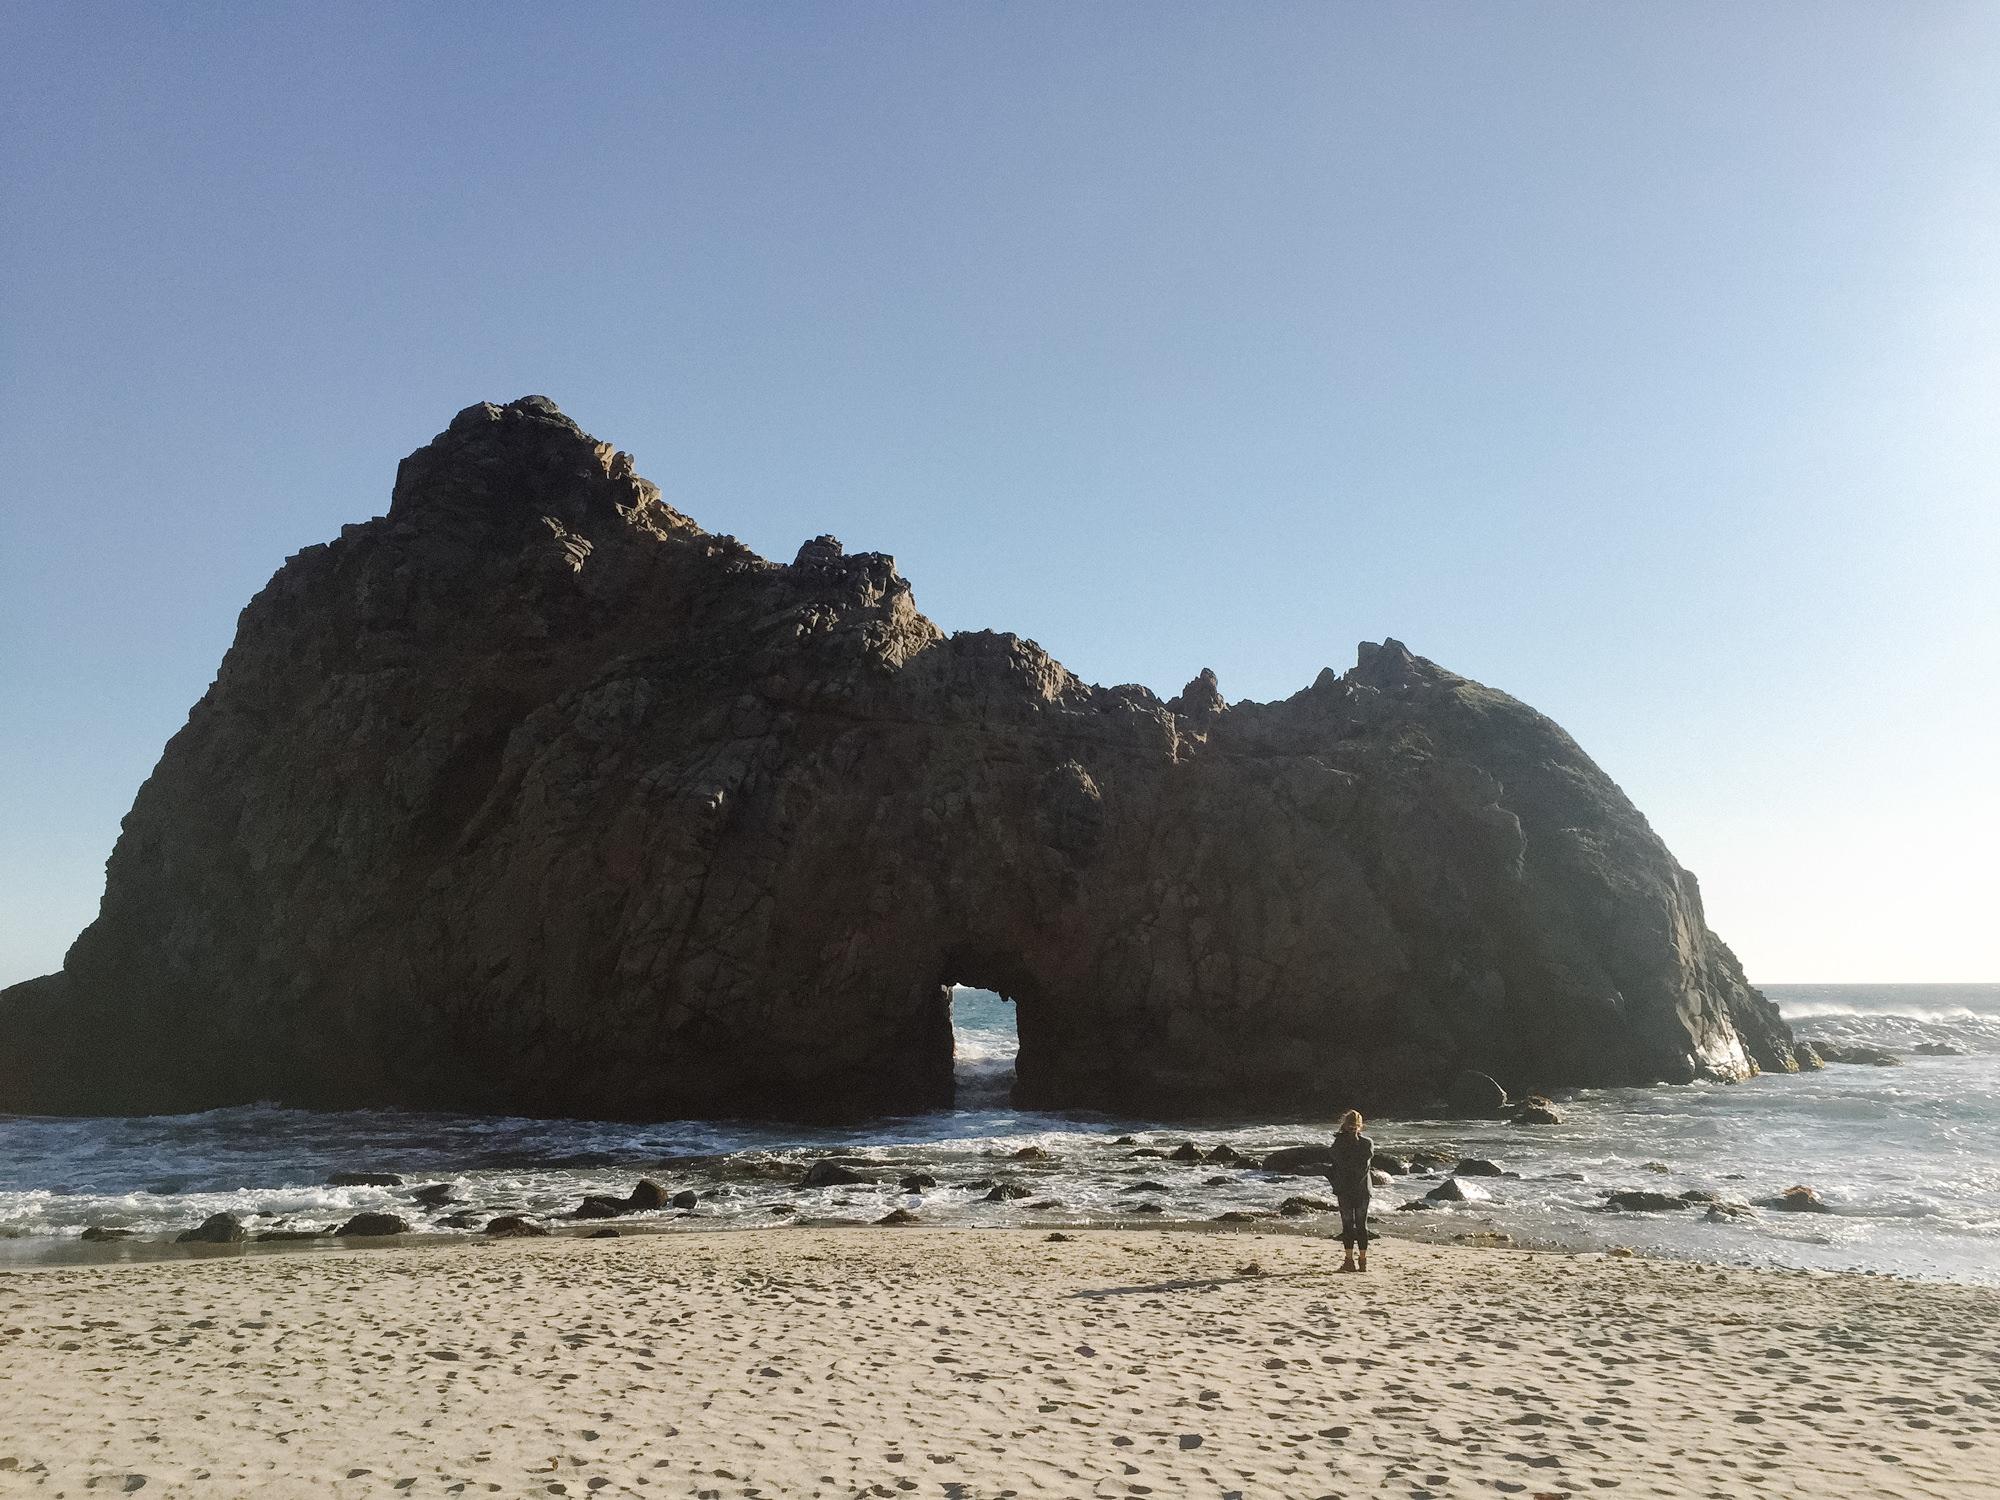 pacific_coast_road_trip-18.jpg